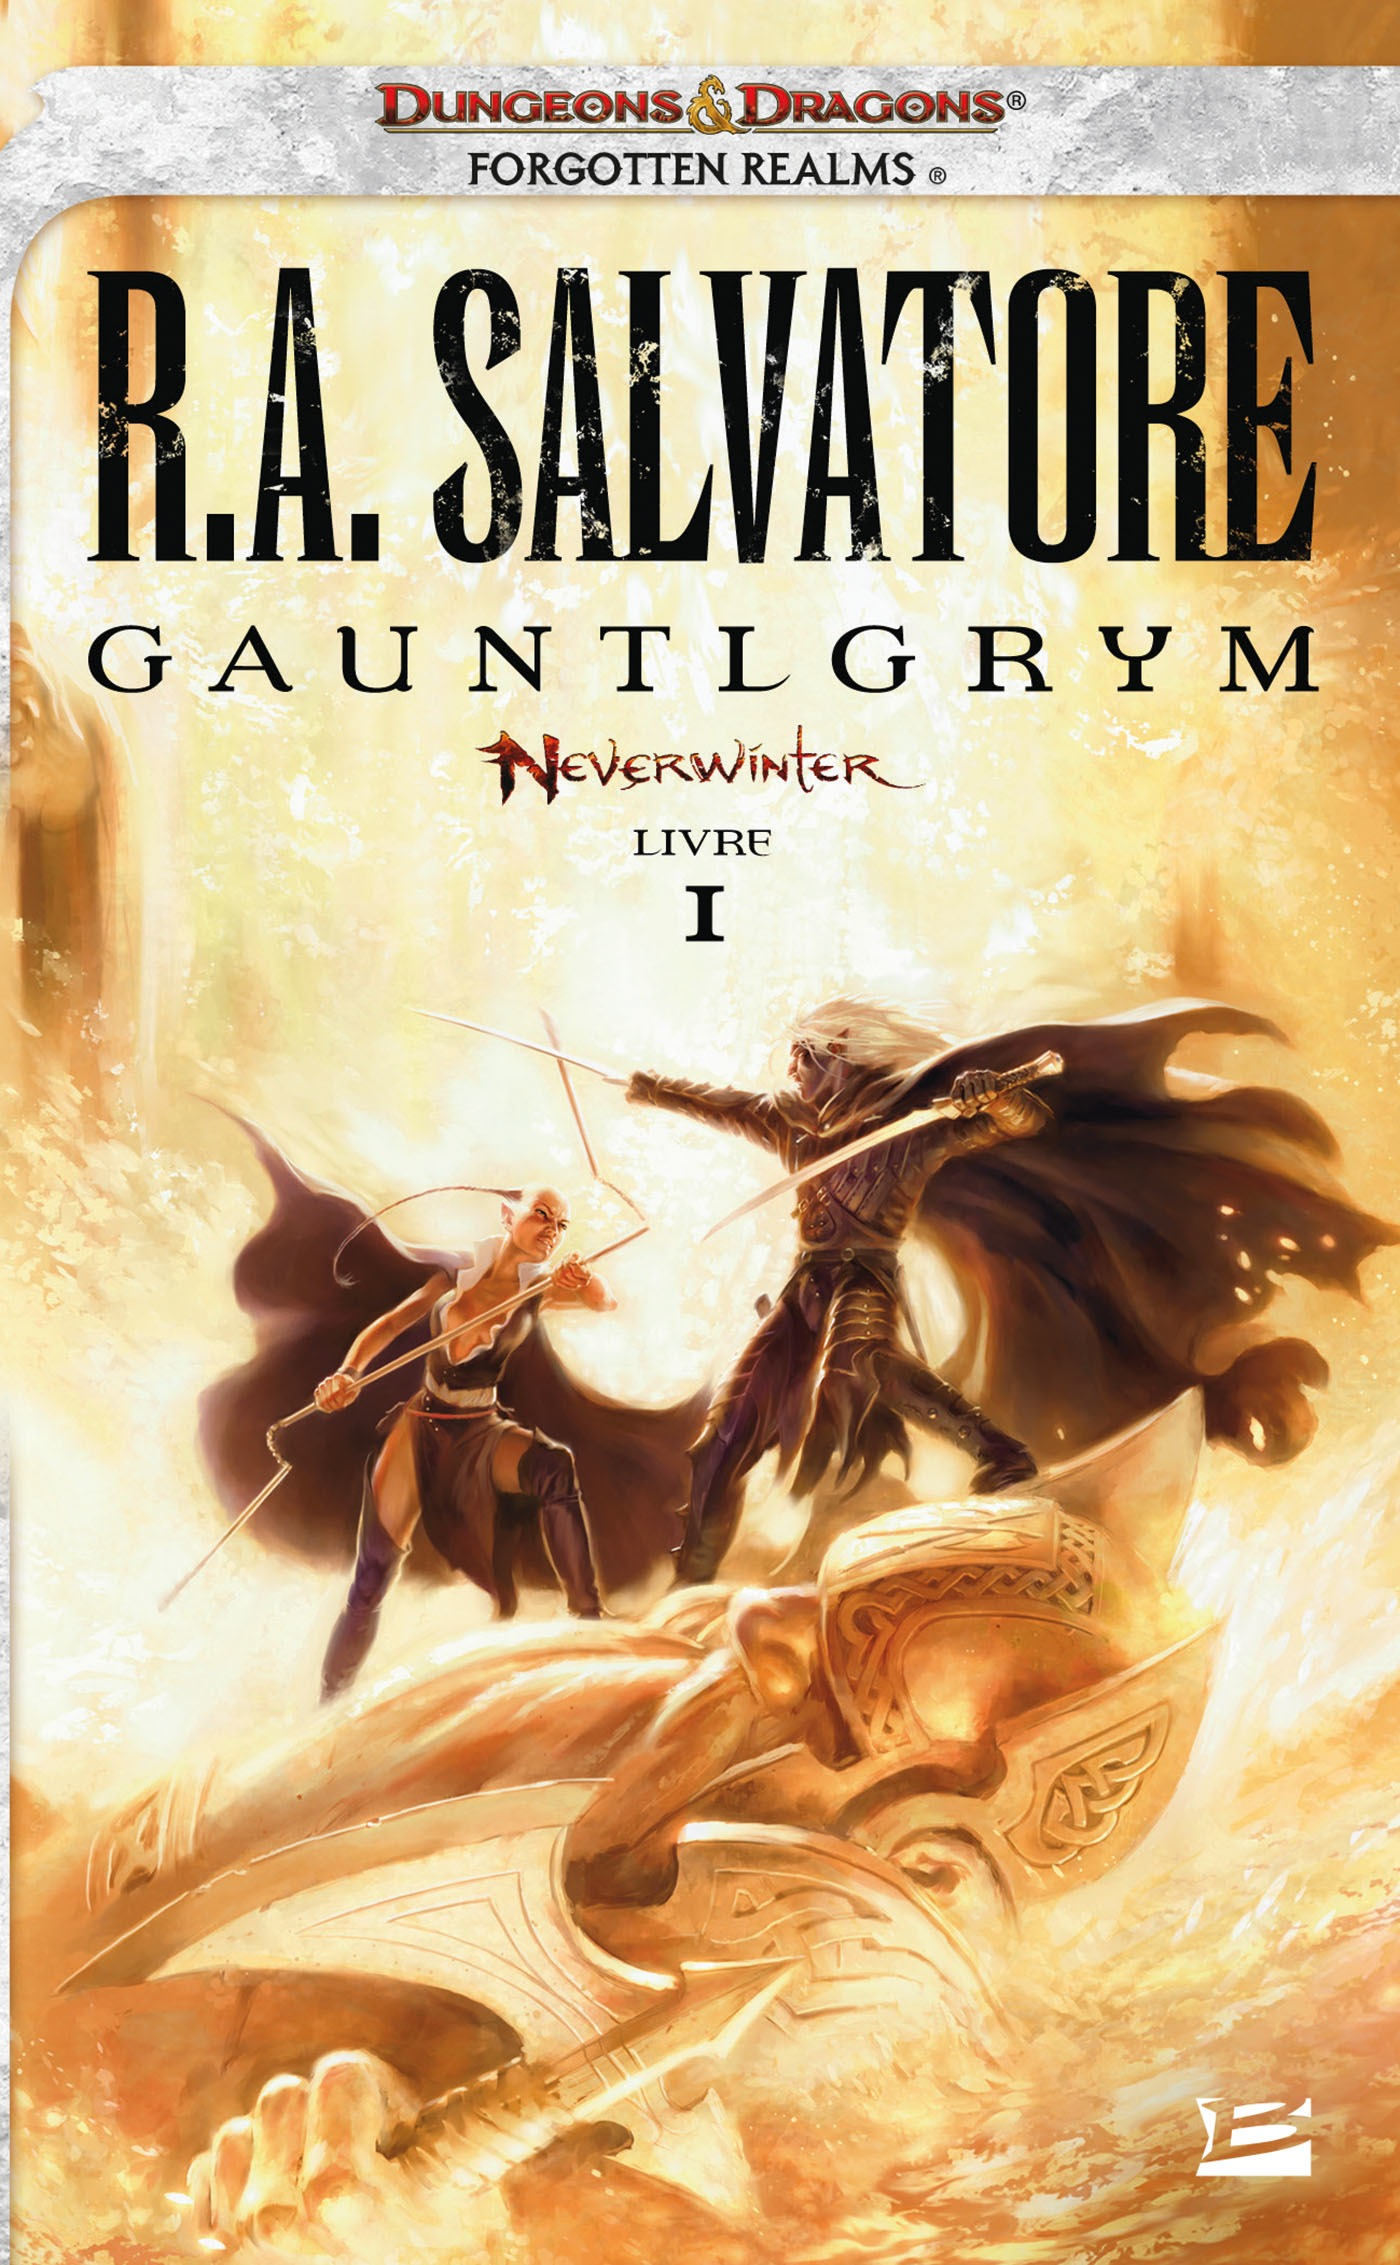 Gauntlgrym, NEVERWINTER, T1